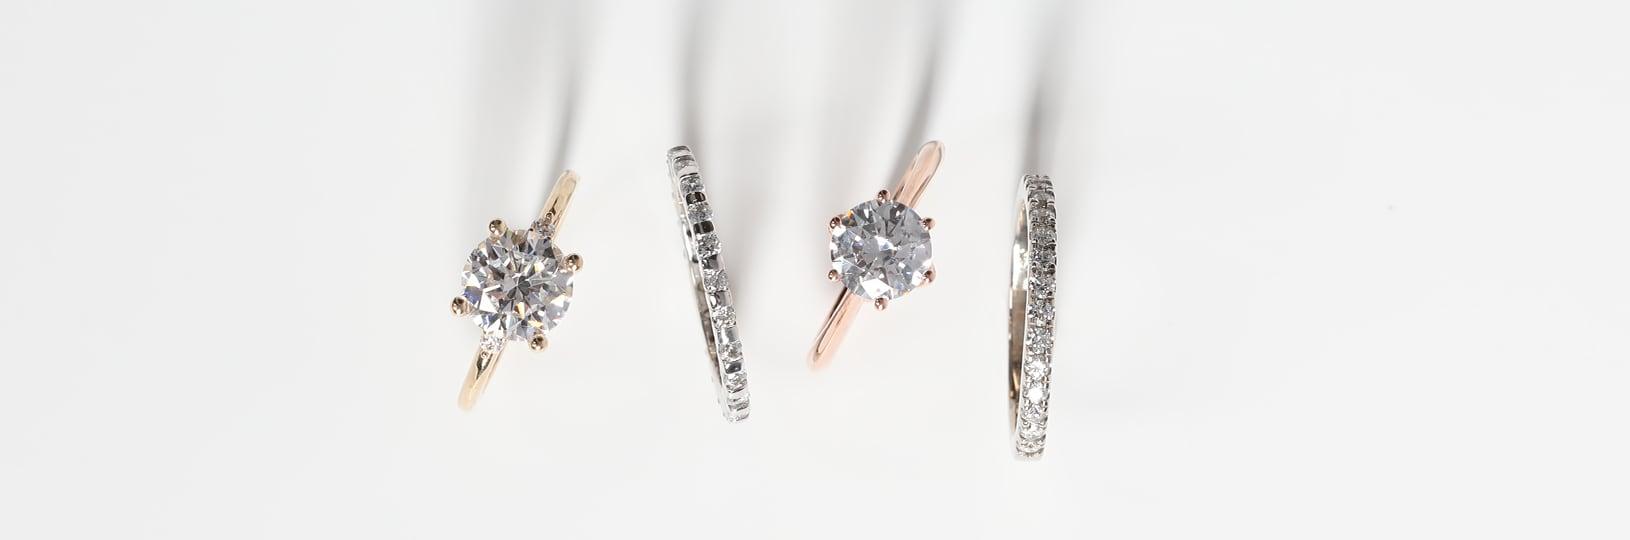 Simulated diamond engagement rings.